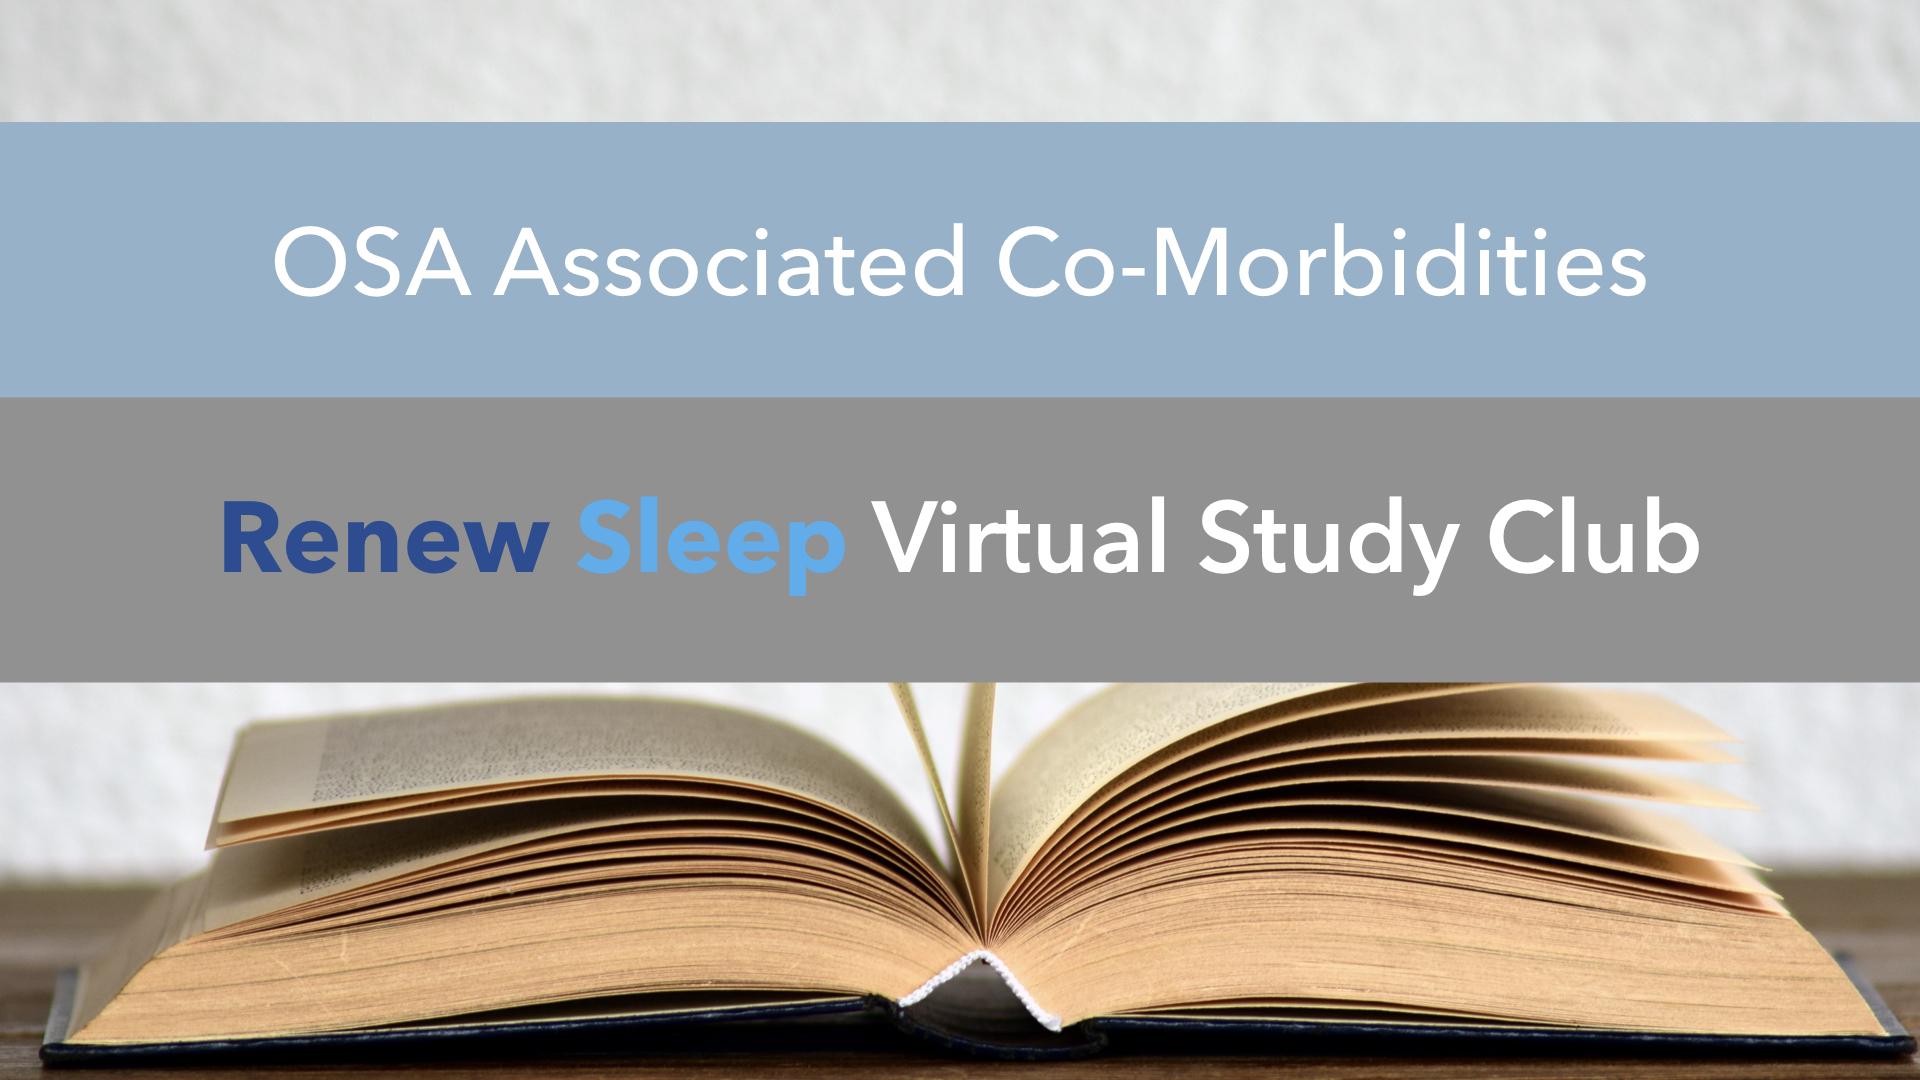 OSA Associated Co-Morbidities.jpeg